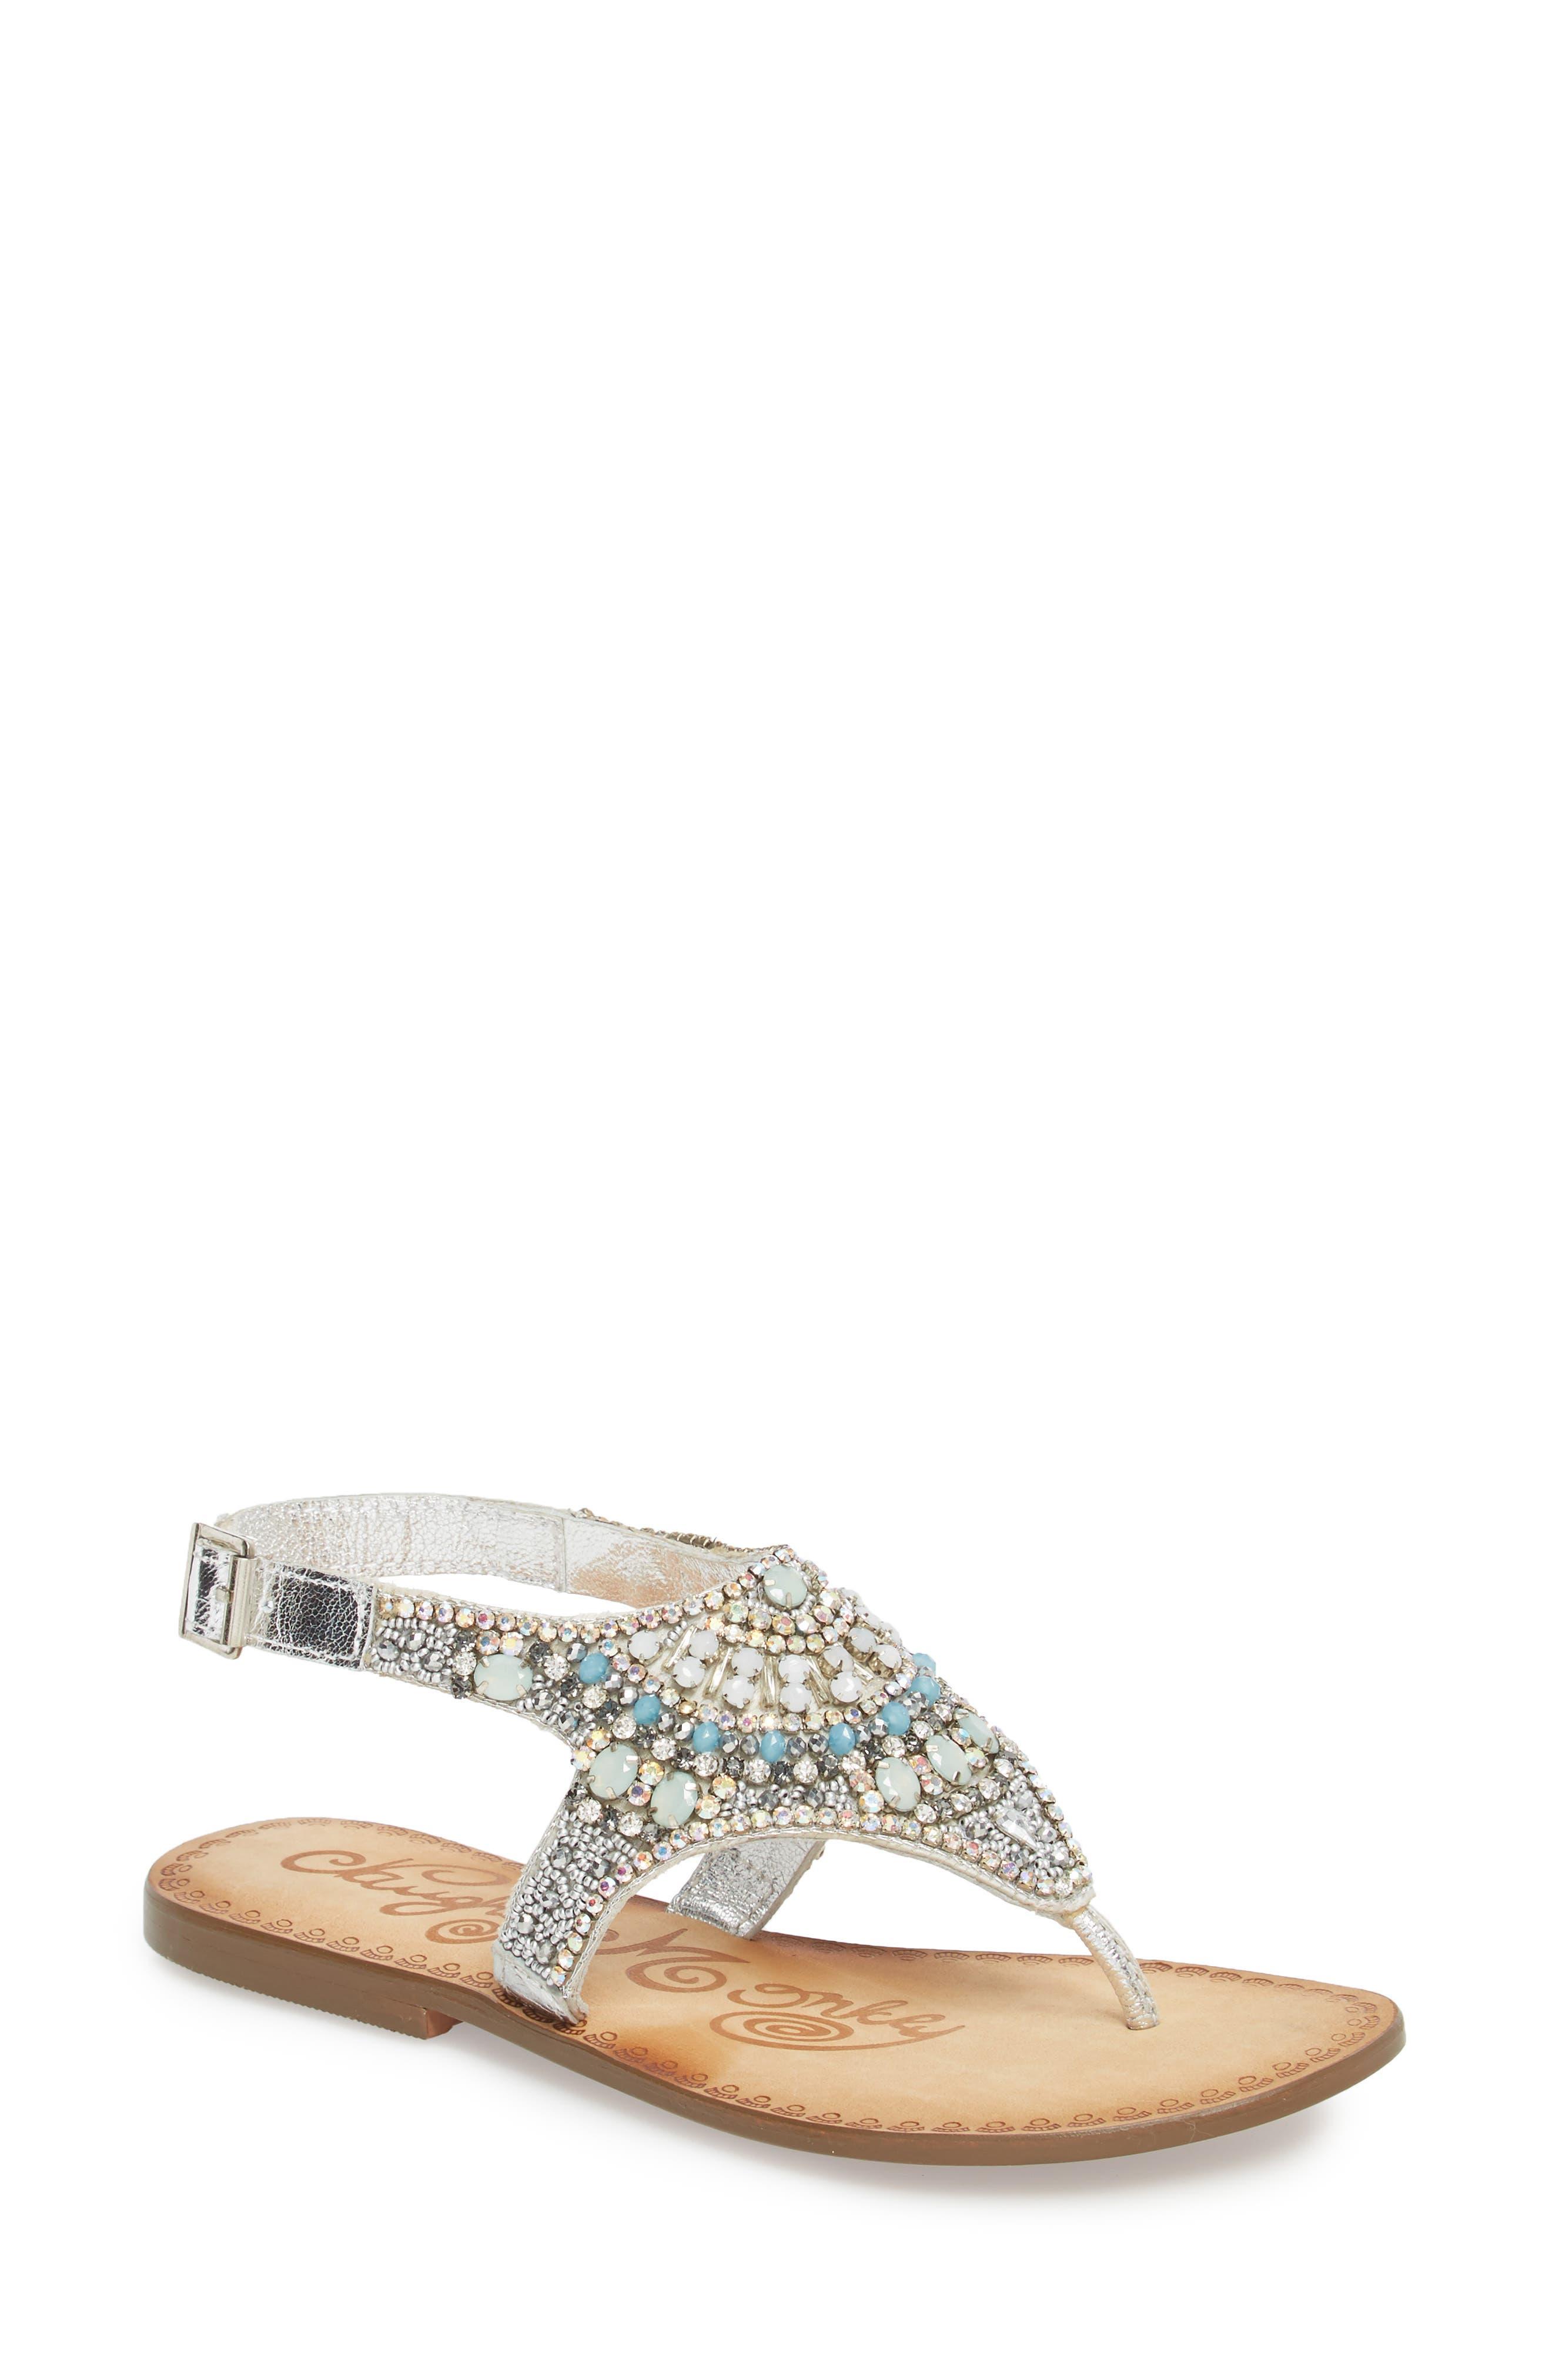 Iceberg Crystal Embellished Sandal,                             Main thumbnail 1, color,                             040